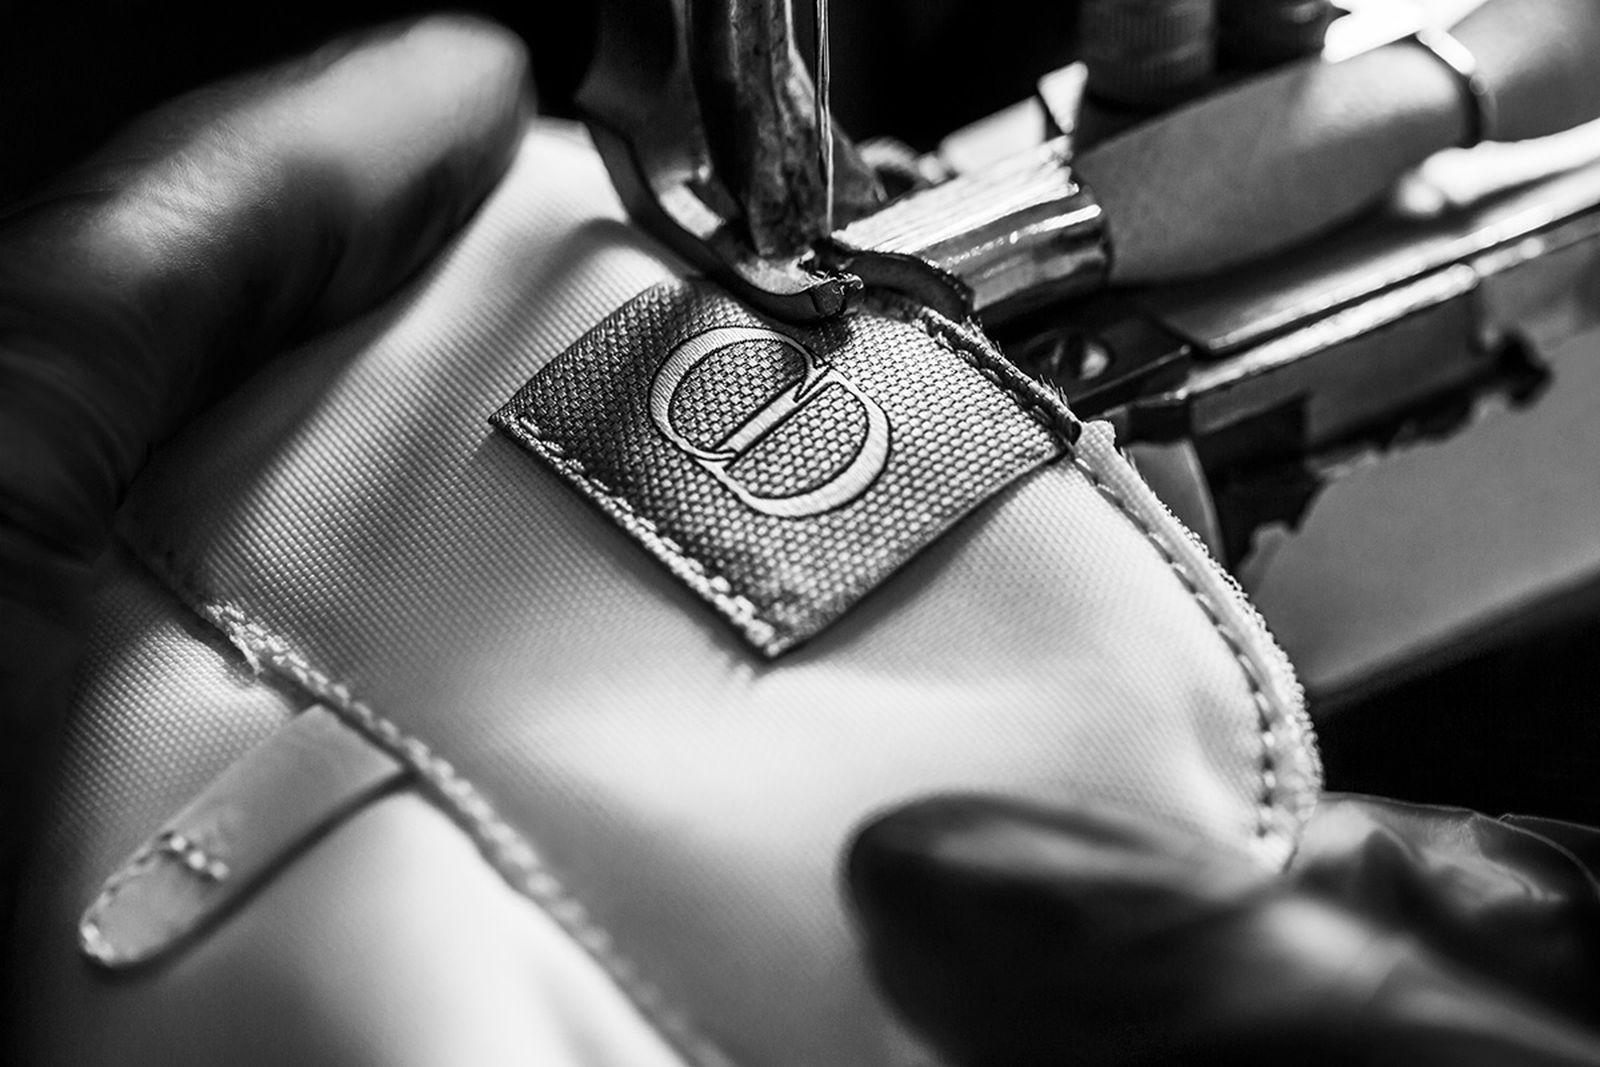 dior-b27-sneaker-release-date-price-new-05